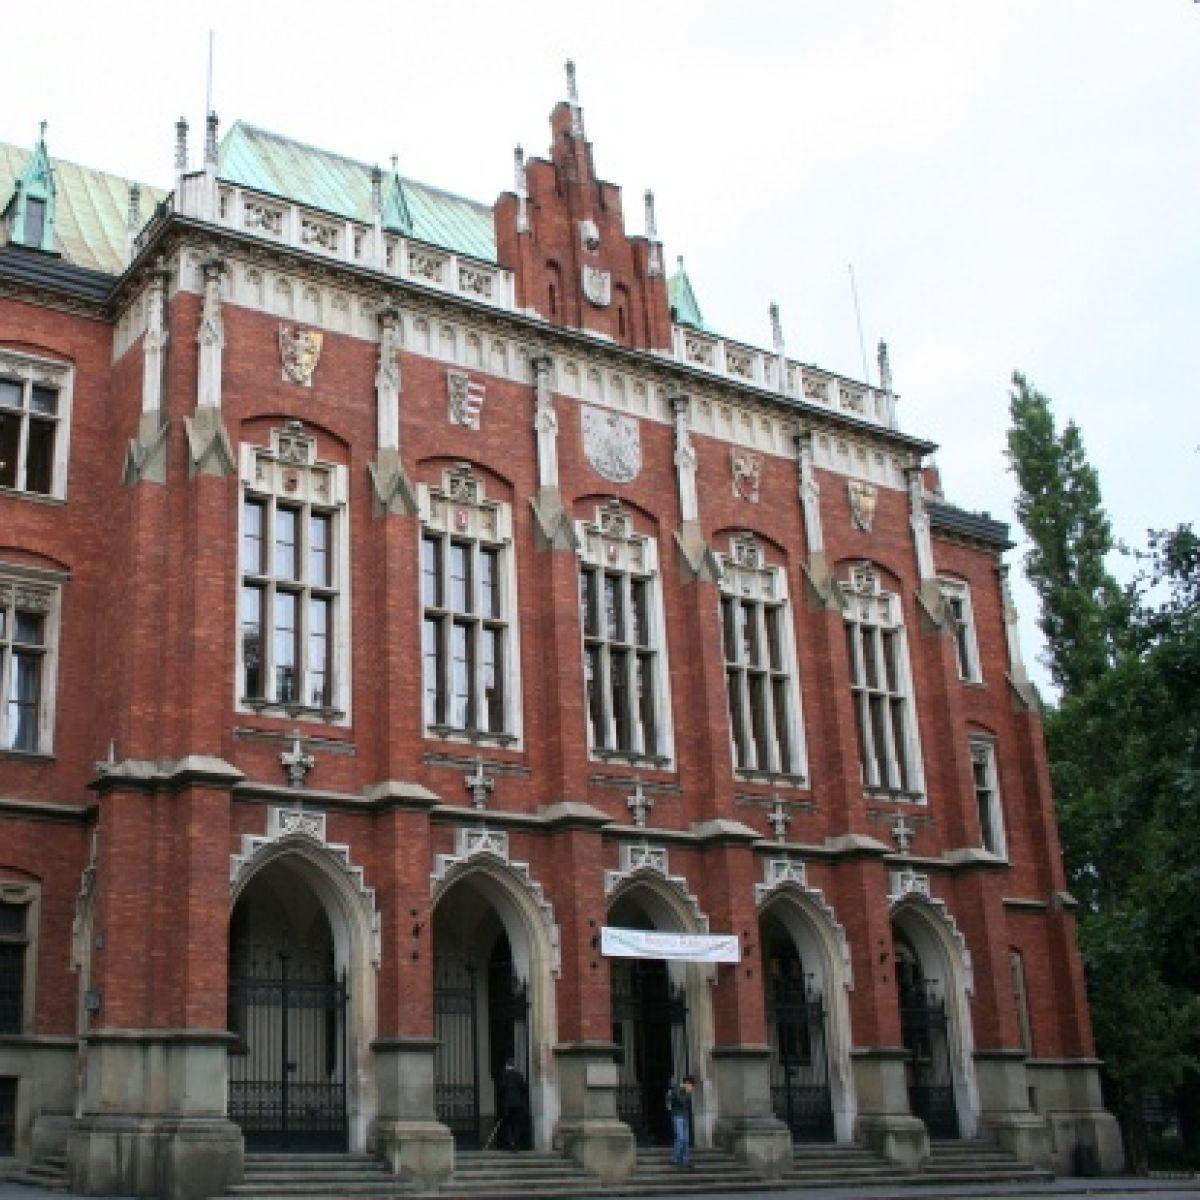 Muzealnicze Studia Kuratorskie Uniwersytet Jagielloński, Historia Sztuki